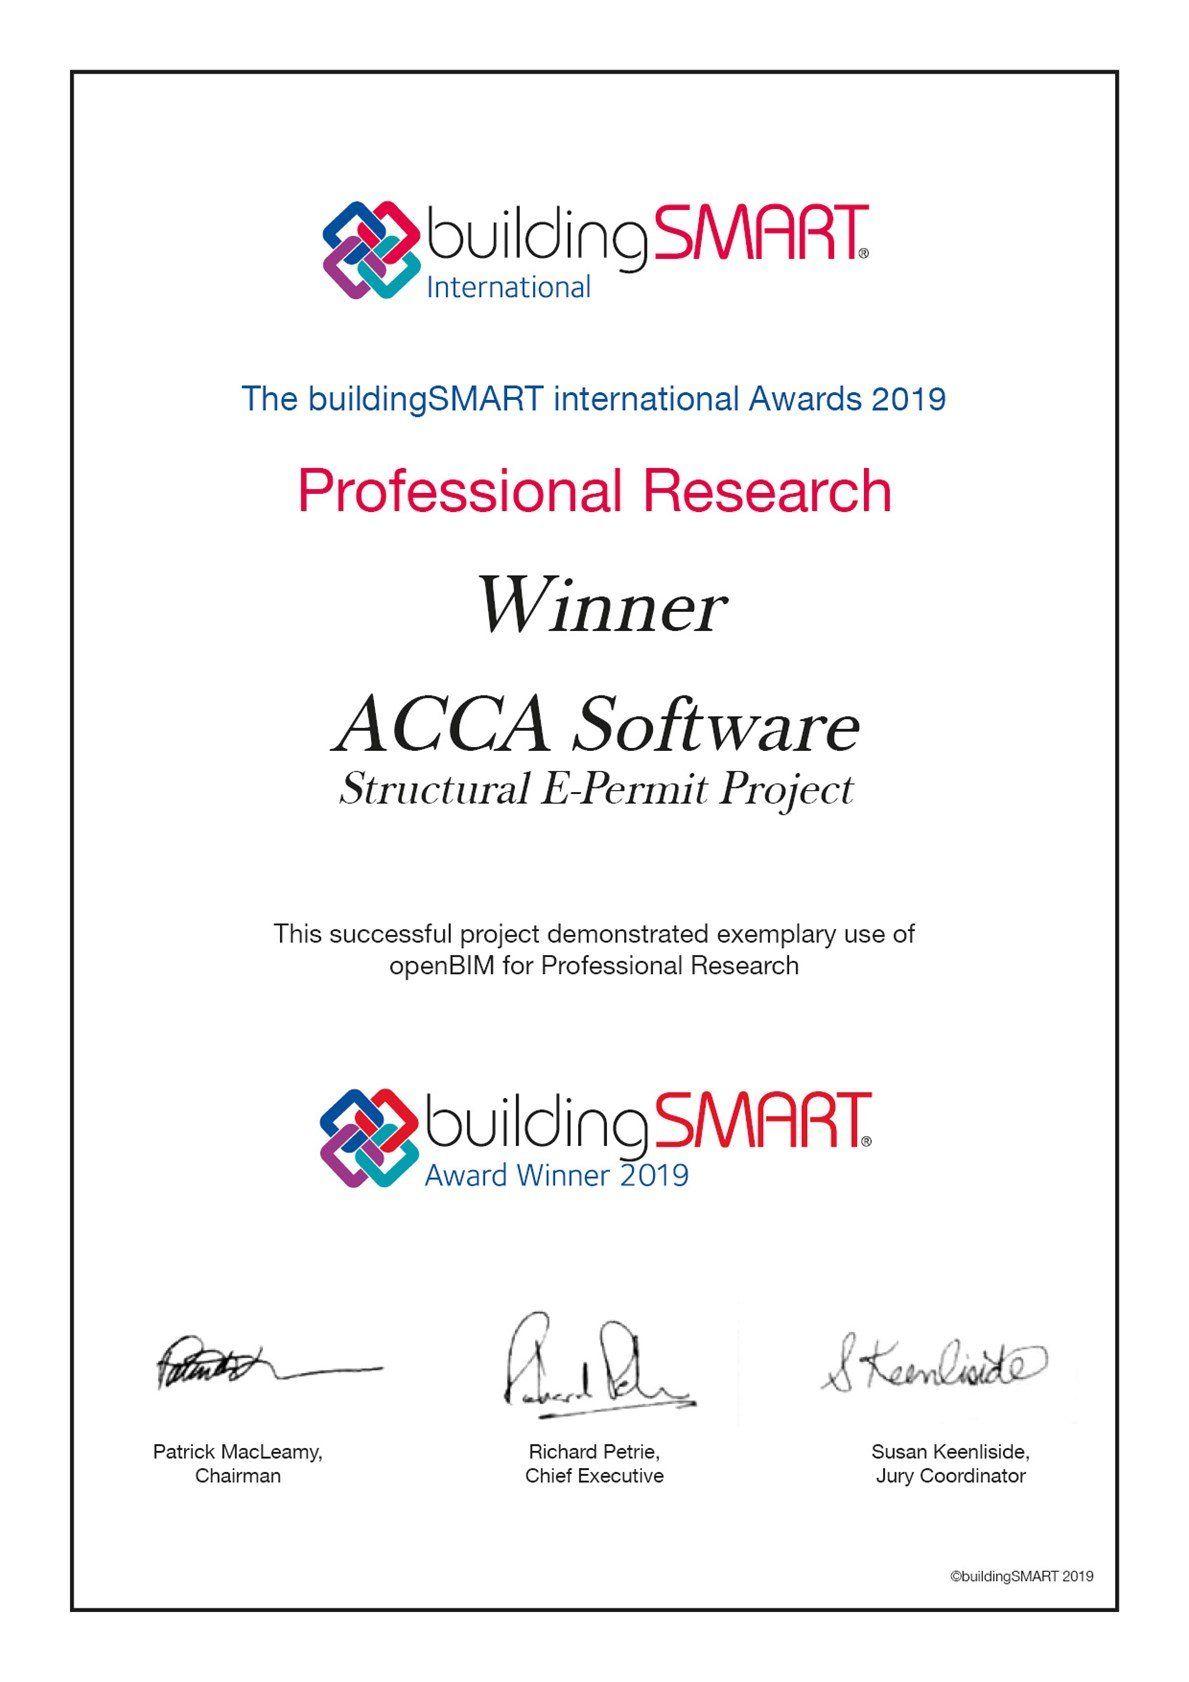 ACCA vince il prestigioso premio buildingSMART International 2019